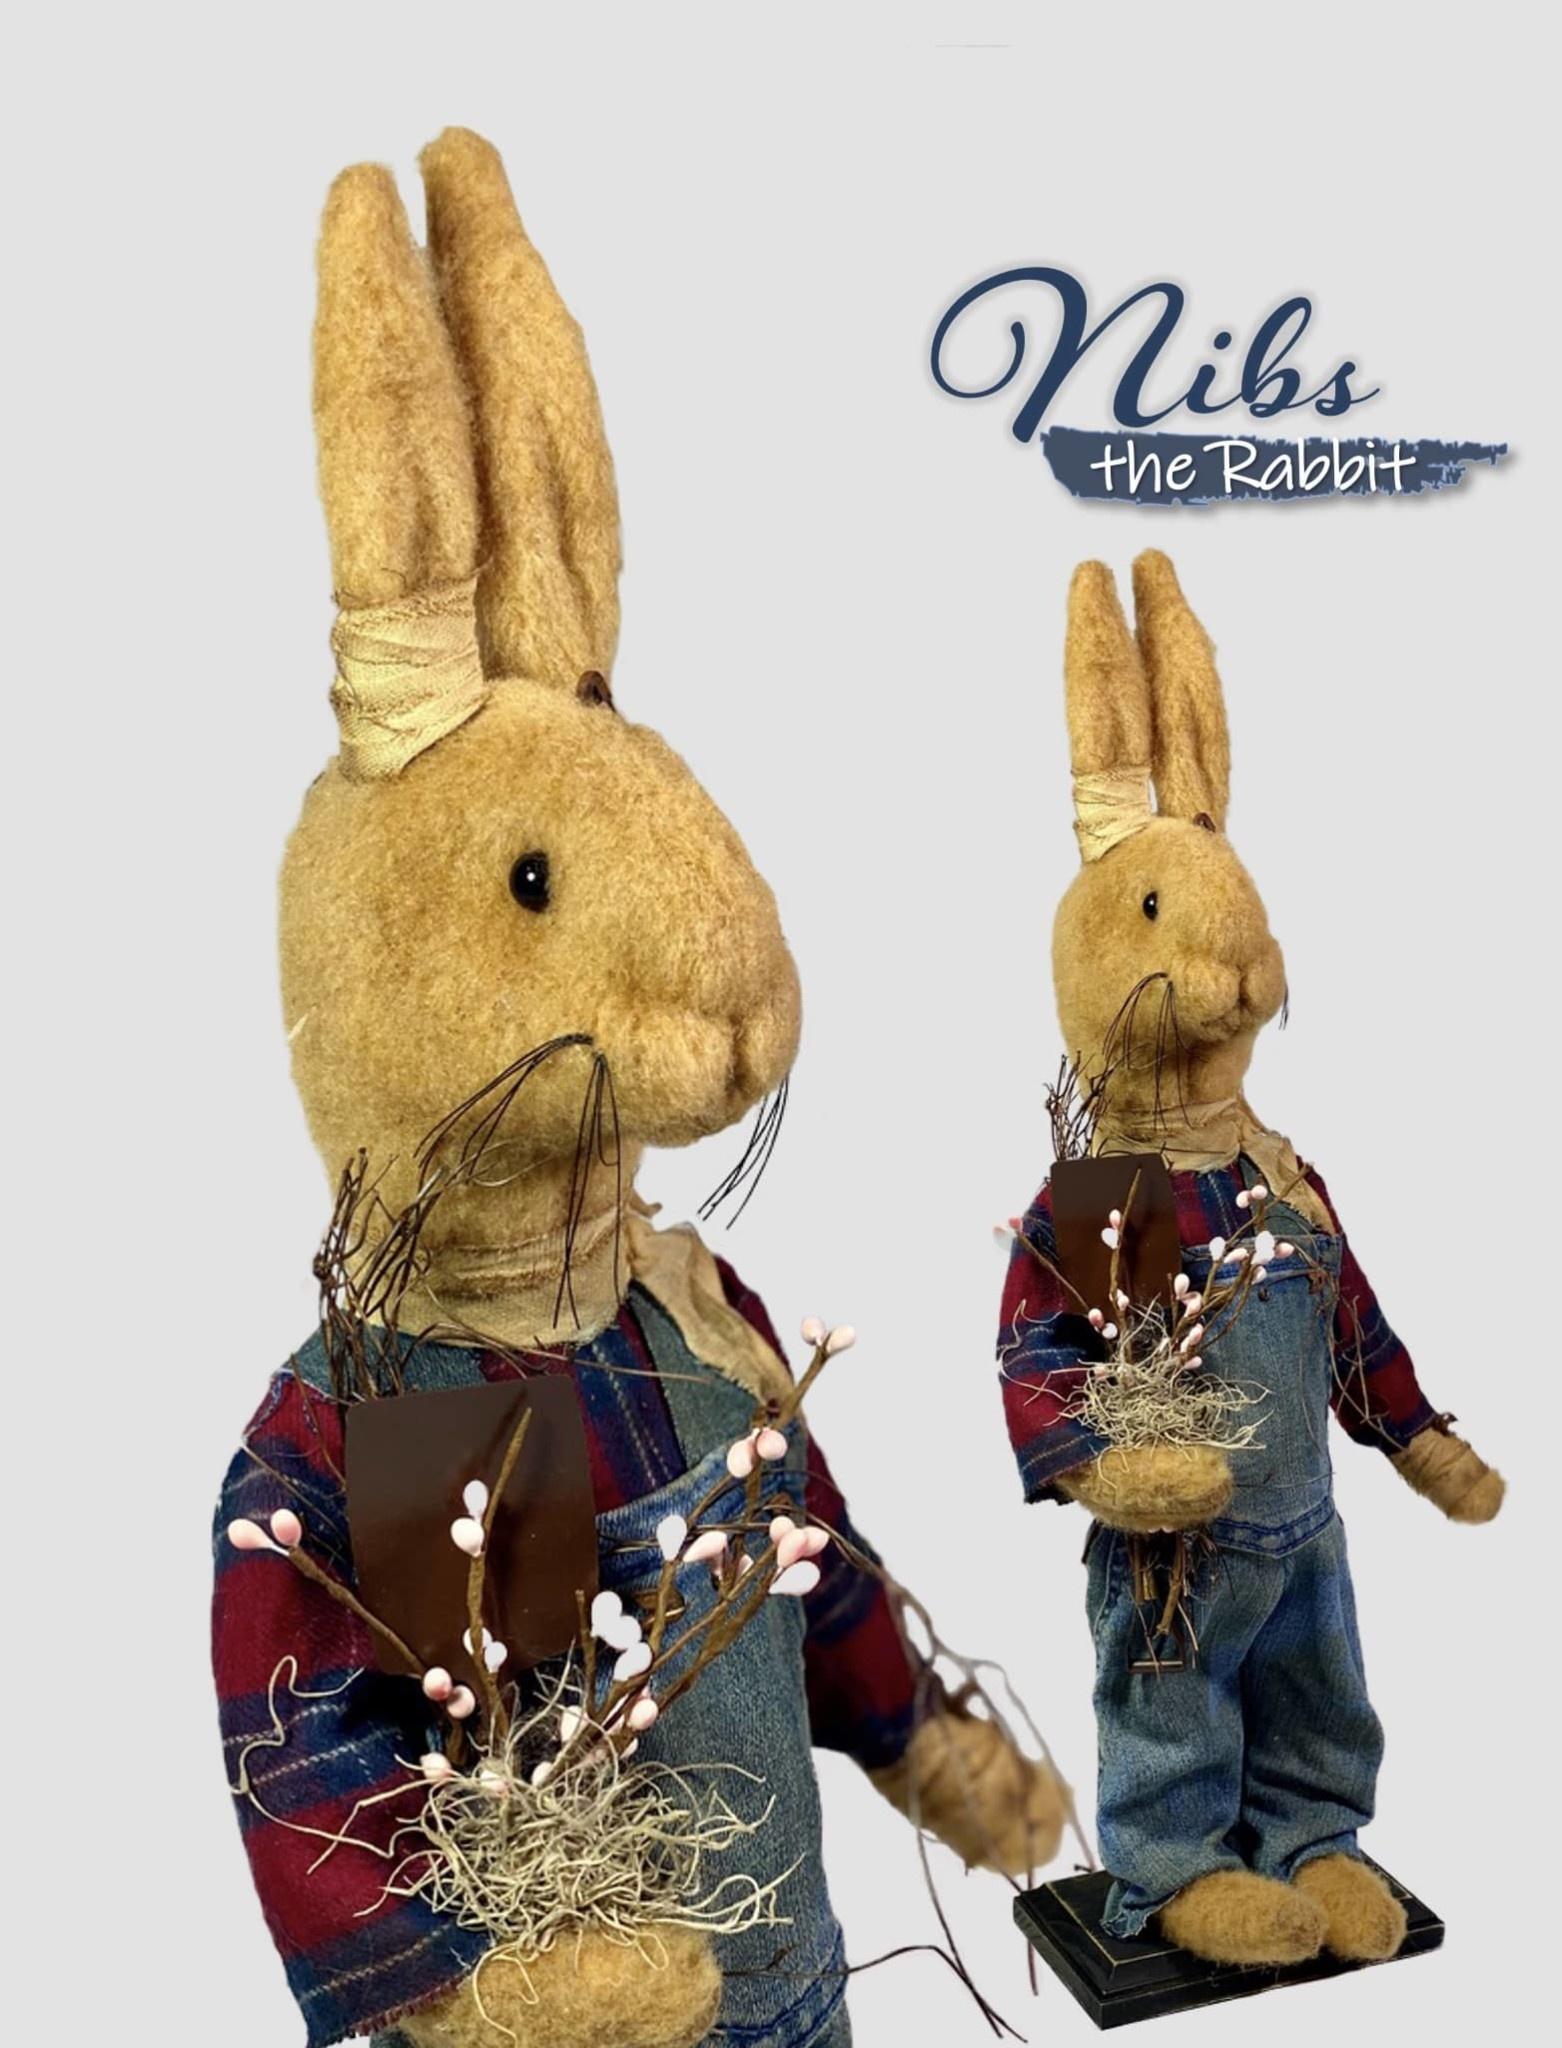 Nana's Farmhouse Nibs The Rabbit Plaid Shirt & Overalls